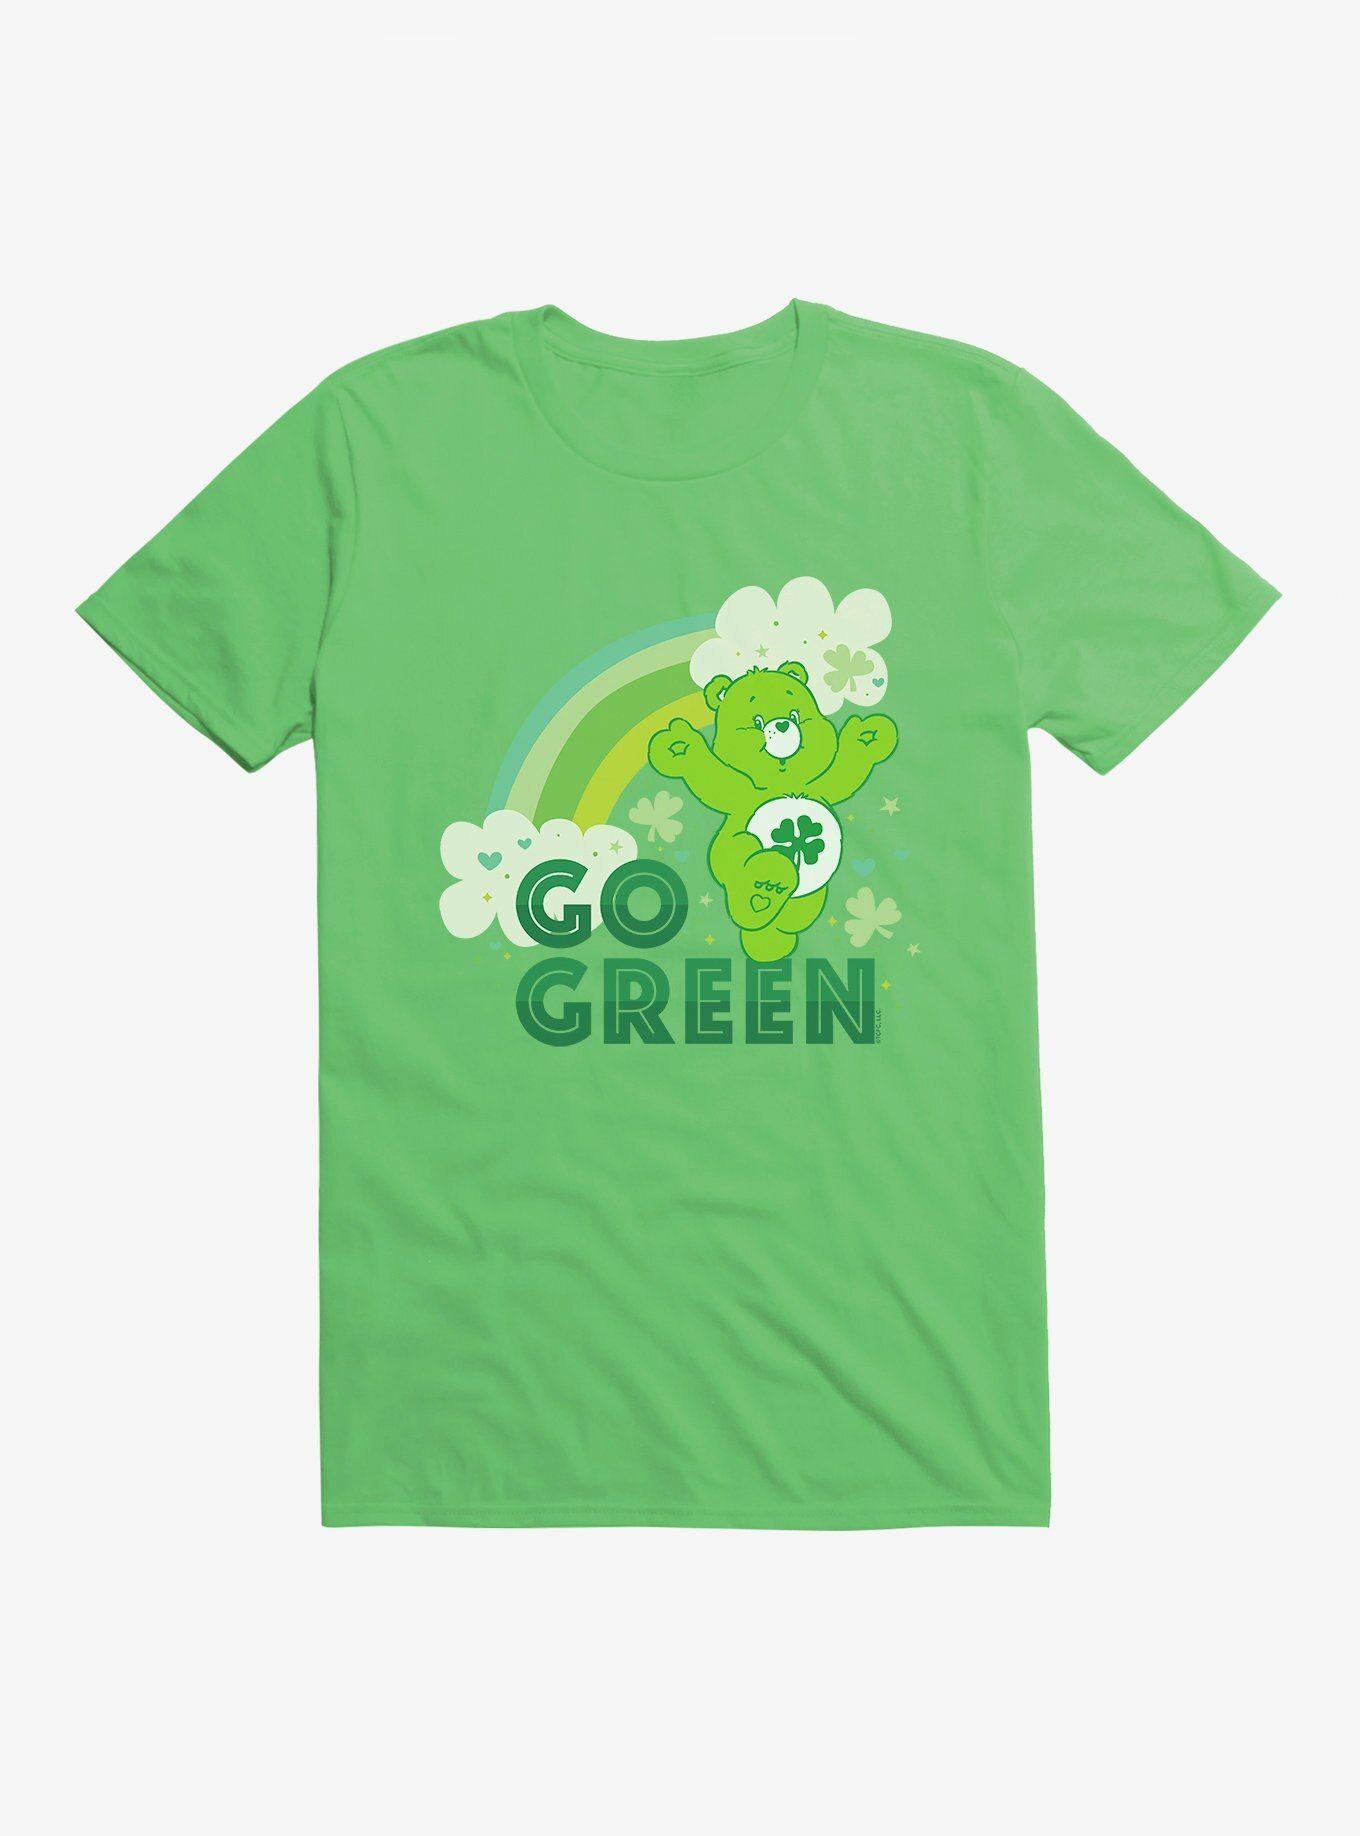 Care Bears Go Green TShirt KELLY GREEN  Long Sleeve Sweatshirt Hoodie